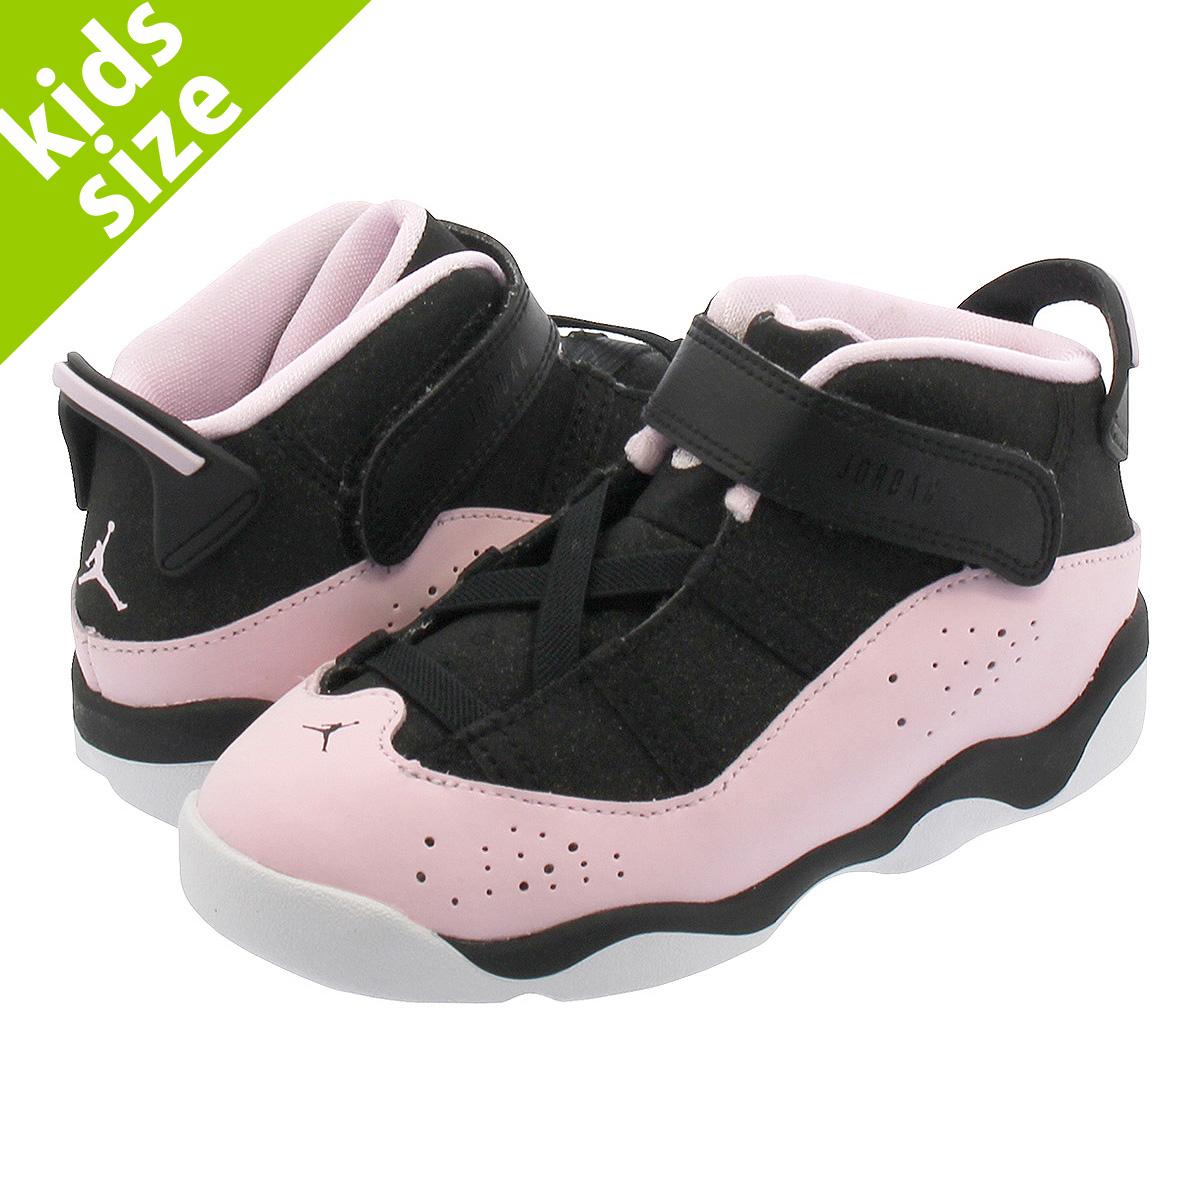 huge selection of 301fc 7101c NIKE JORDAN 6 RINGS GT Nike Air Jordan 6 RINGS Co.,Ltd. GT BLACK/PINK  FOAM/ANTHRACITE/WHITE 942,780-006